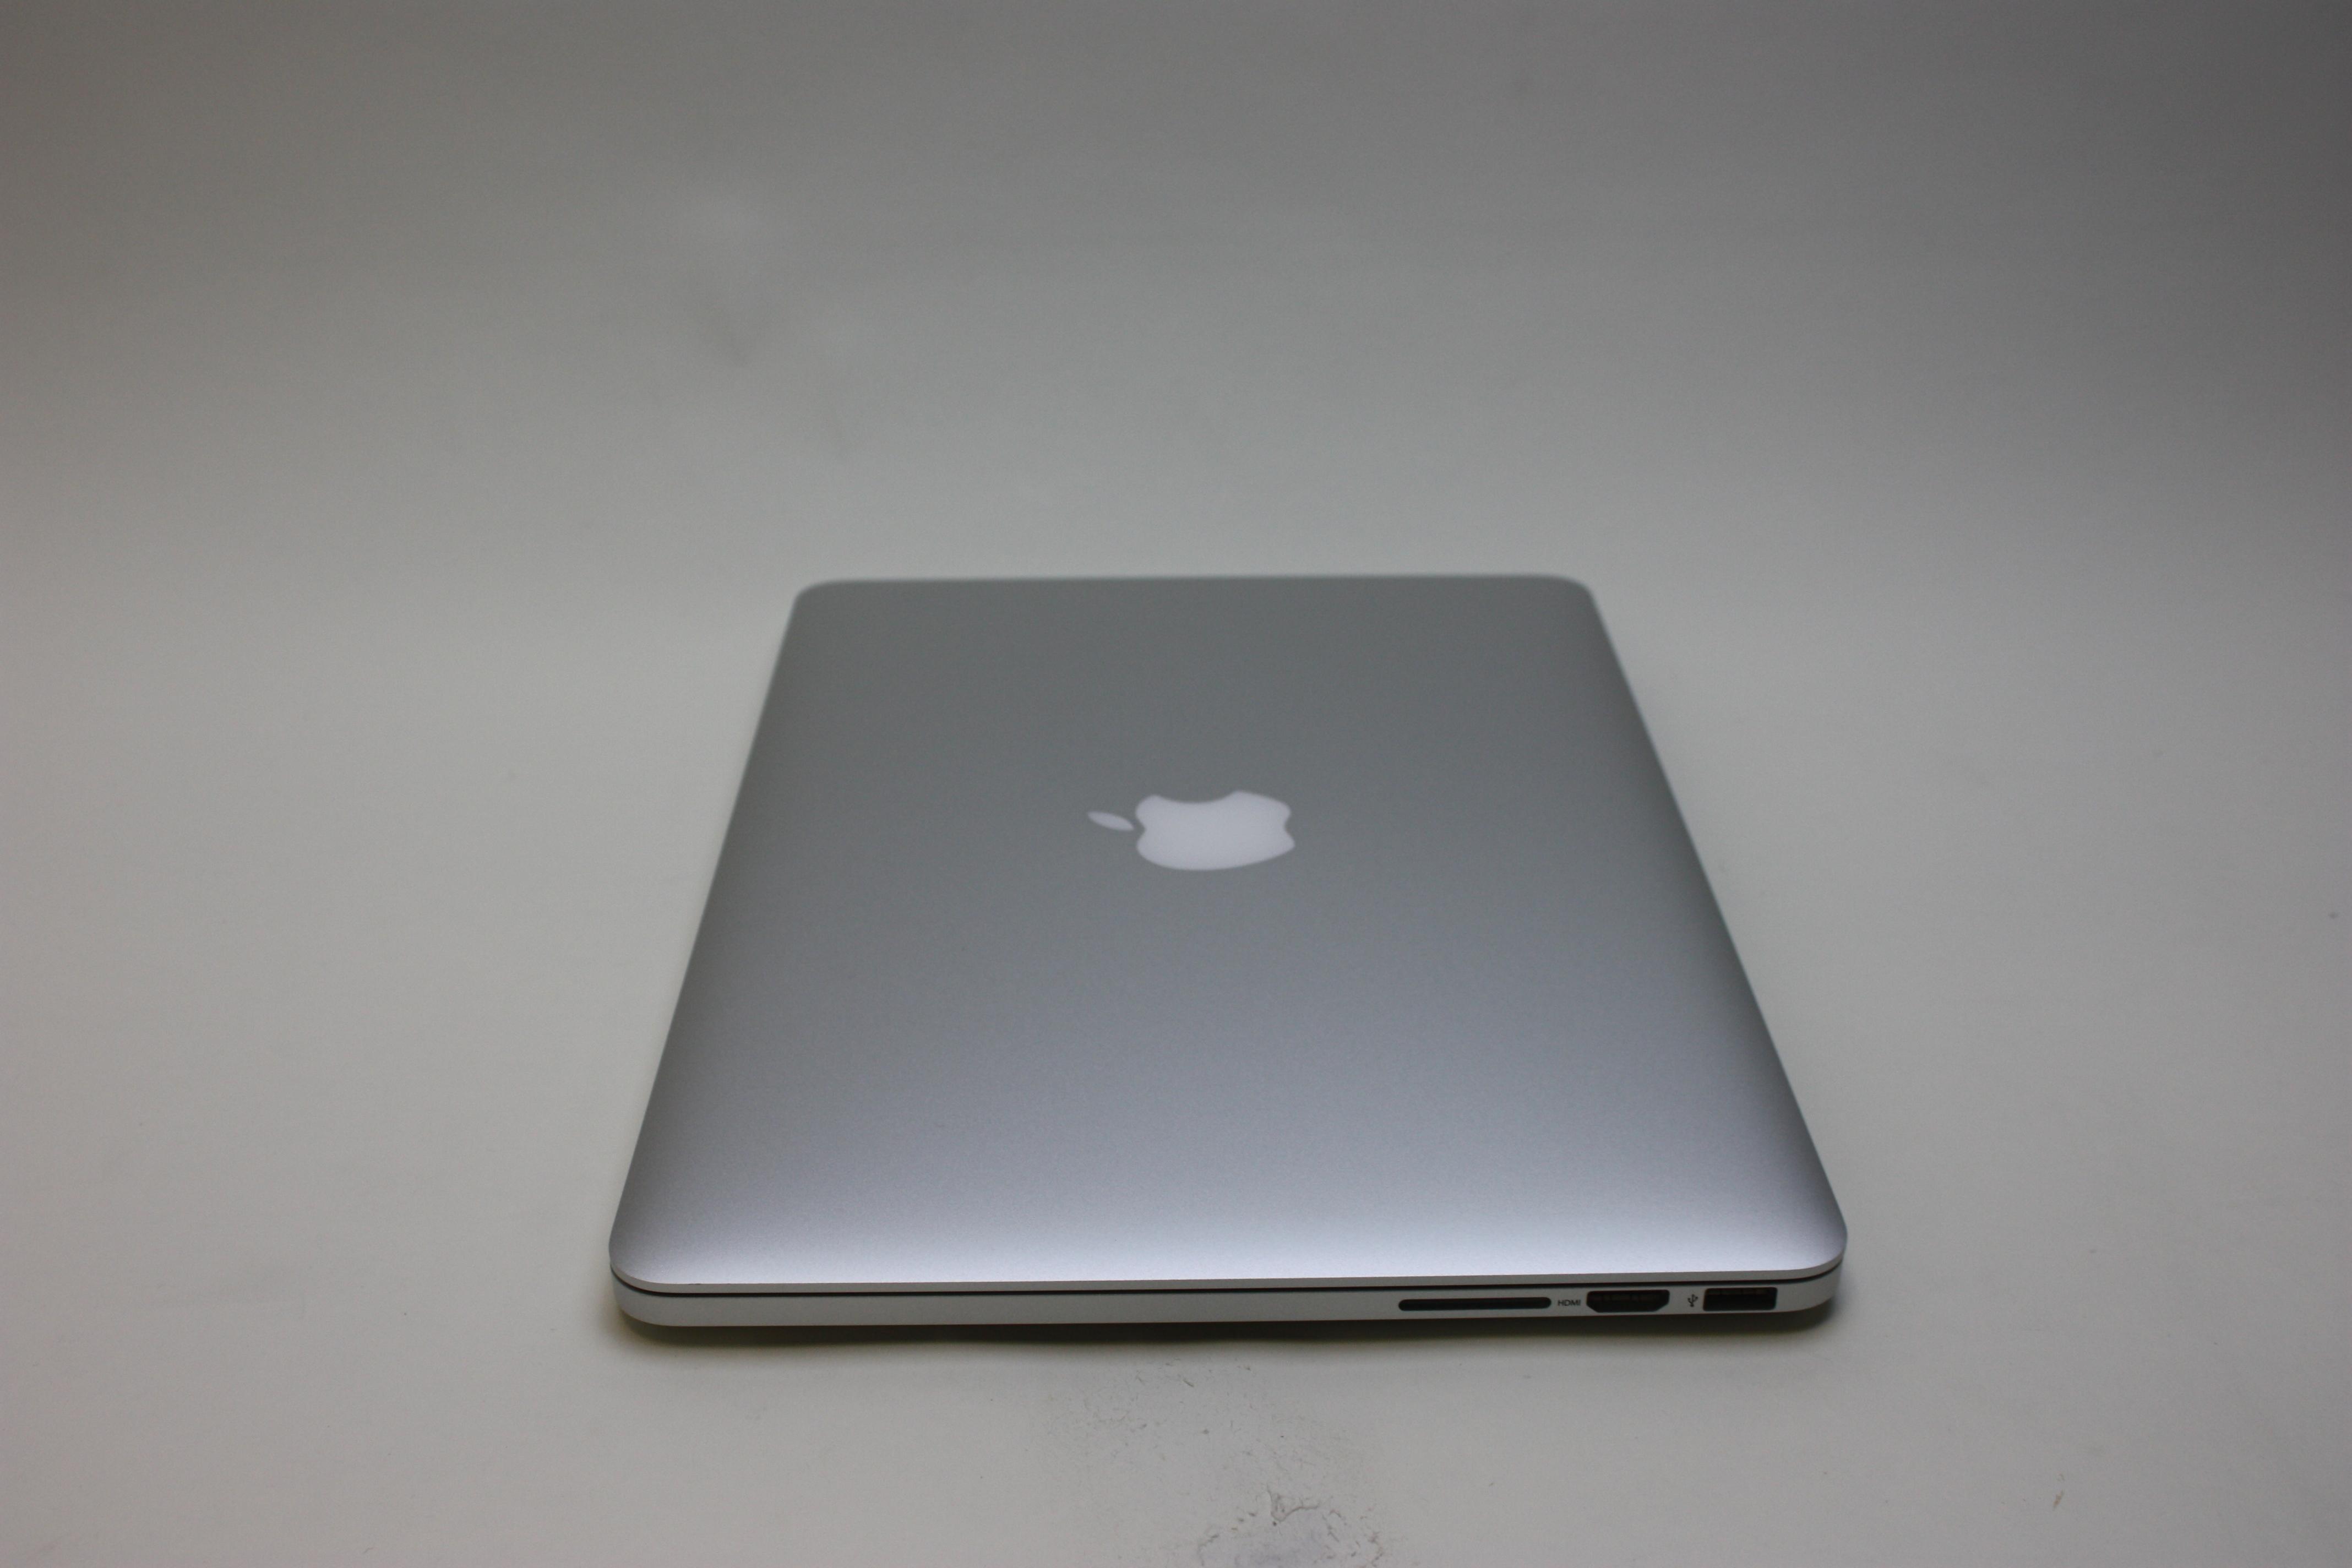 MacBook Pro 13-inch Retina, 2.7 GHz Core i5 (I5-5257U), 8 GB 1867 MHz DDR3, 128 GB Flash Storage, image 7